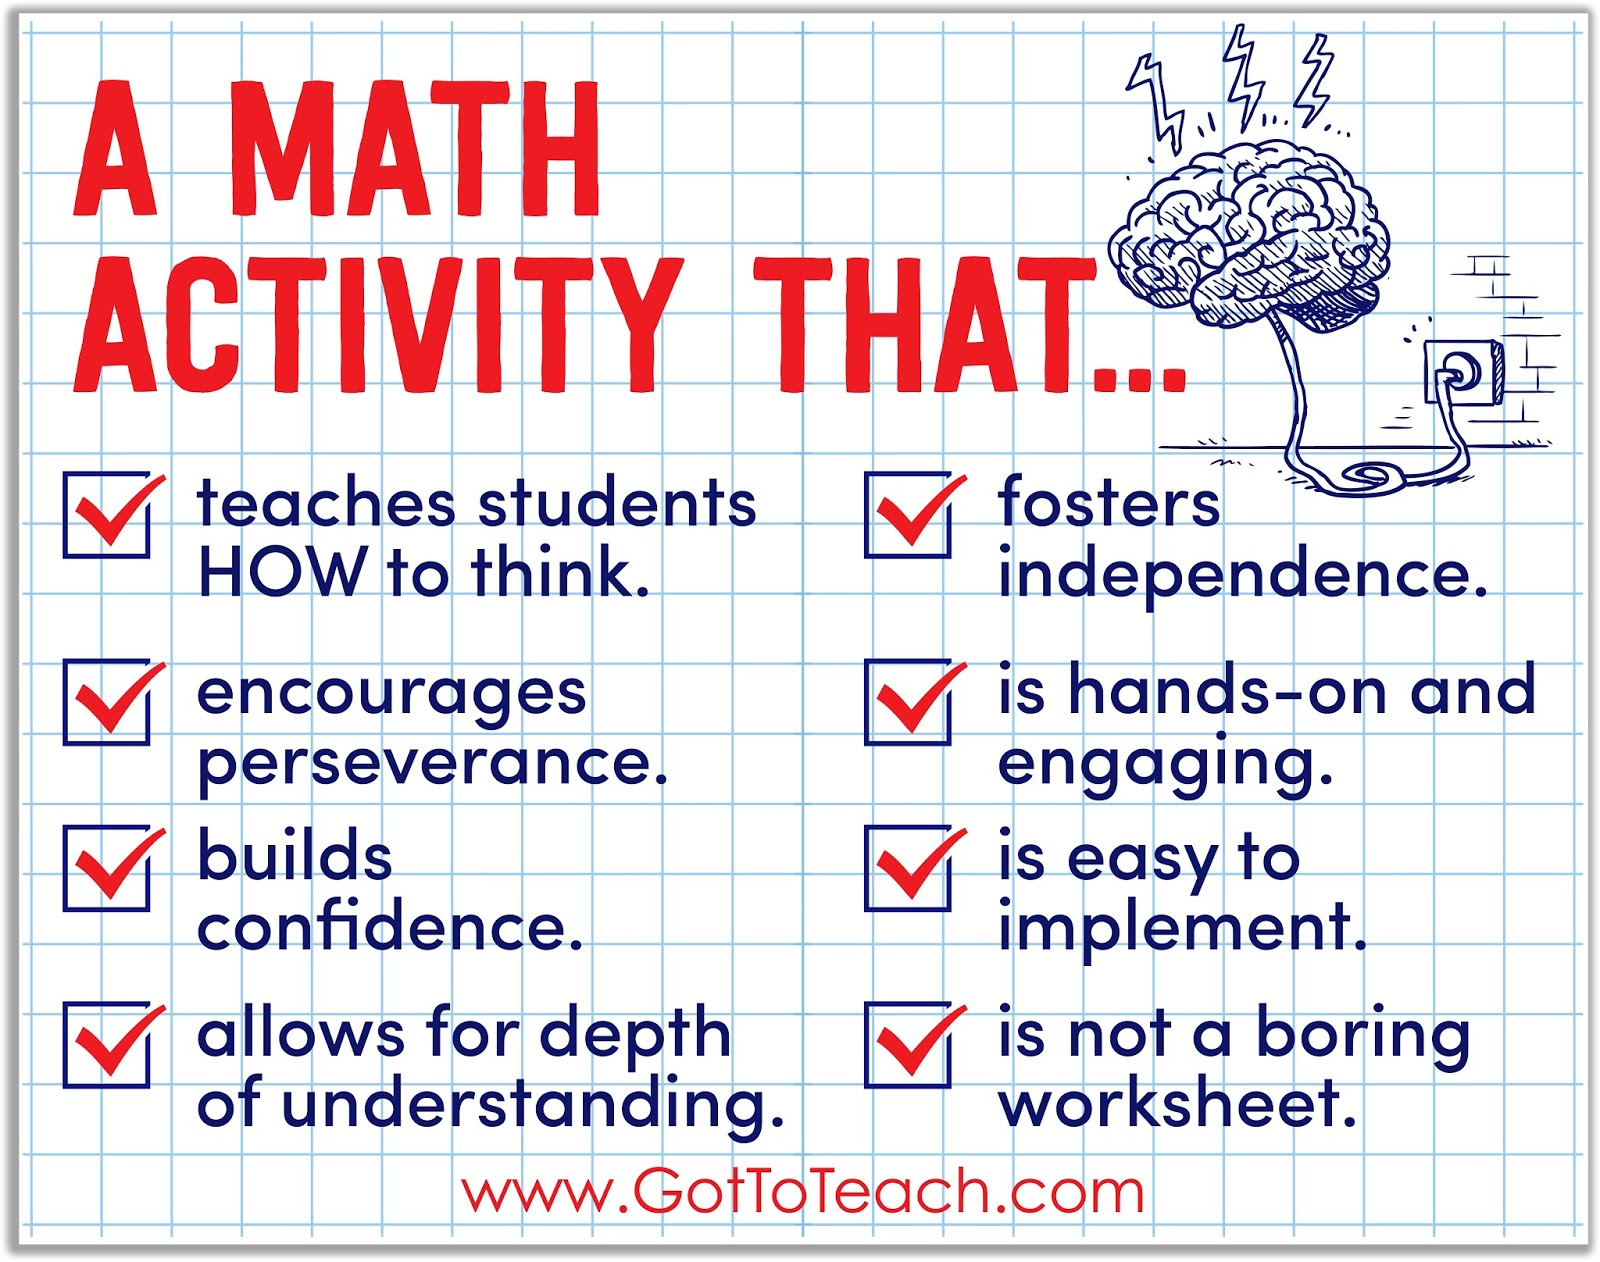 My Favorite Math Activity Got To Teach